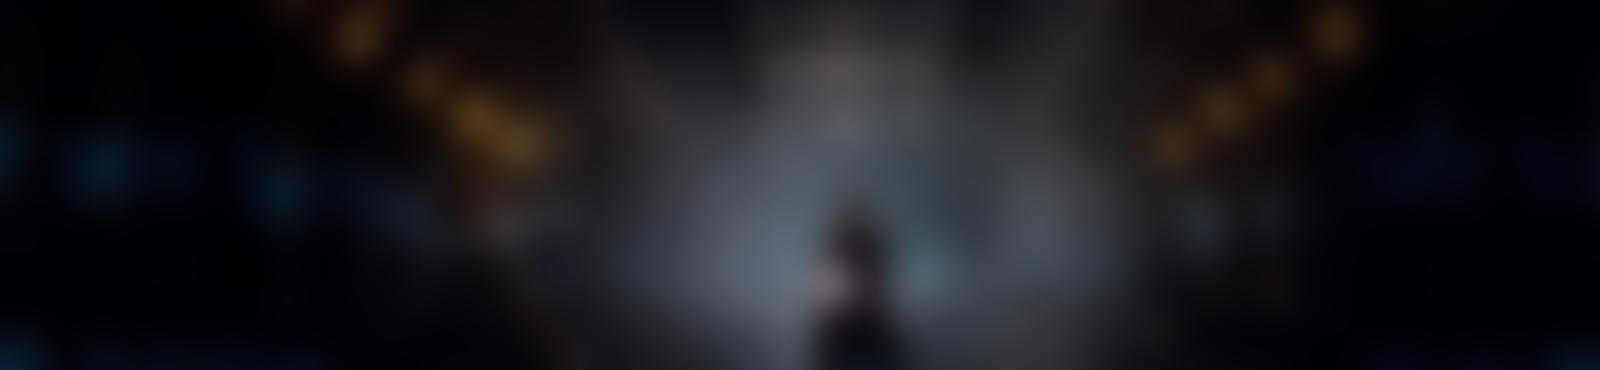 Blurred 9ac7b3d5 12ed 46e2 a6dc 174f553d1572